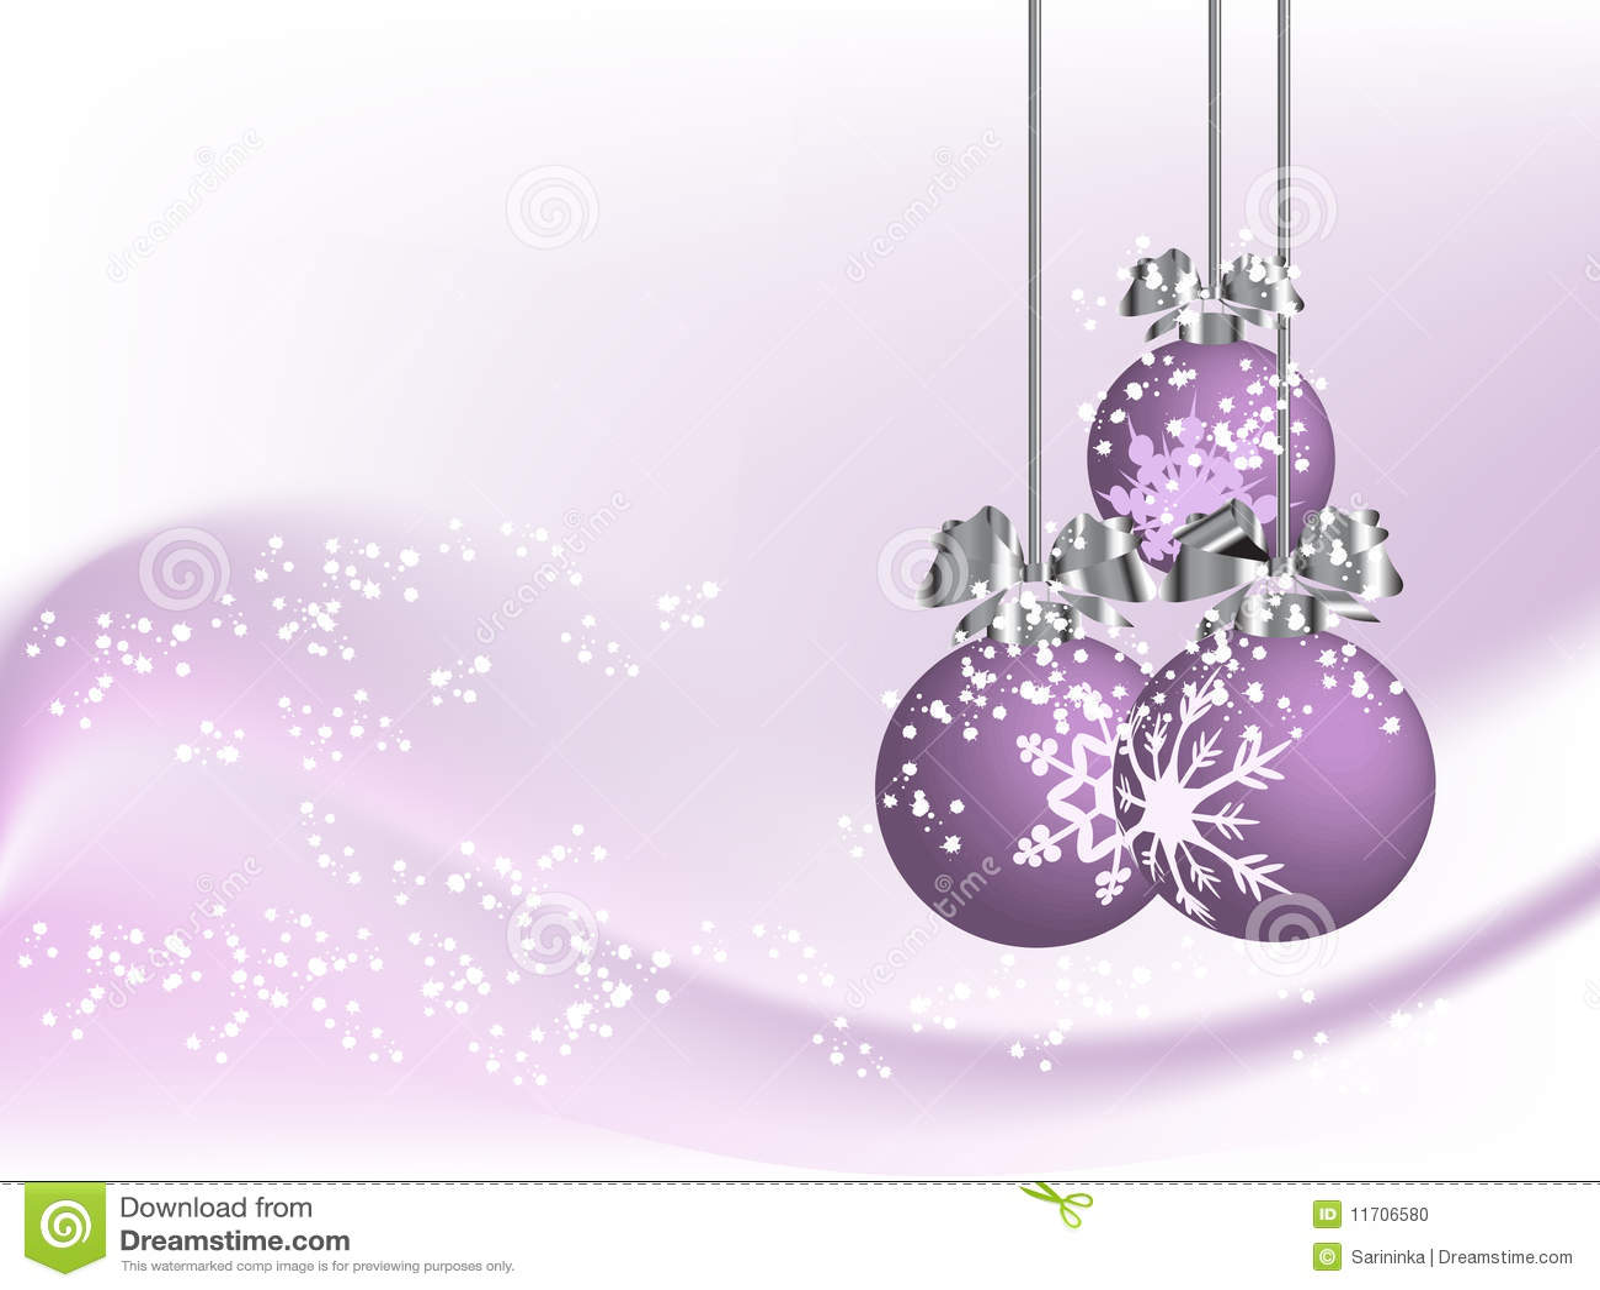 Violet Christmas Stock Vector Illustration Of Illustration 11706580